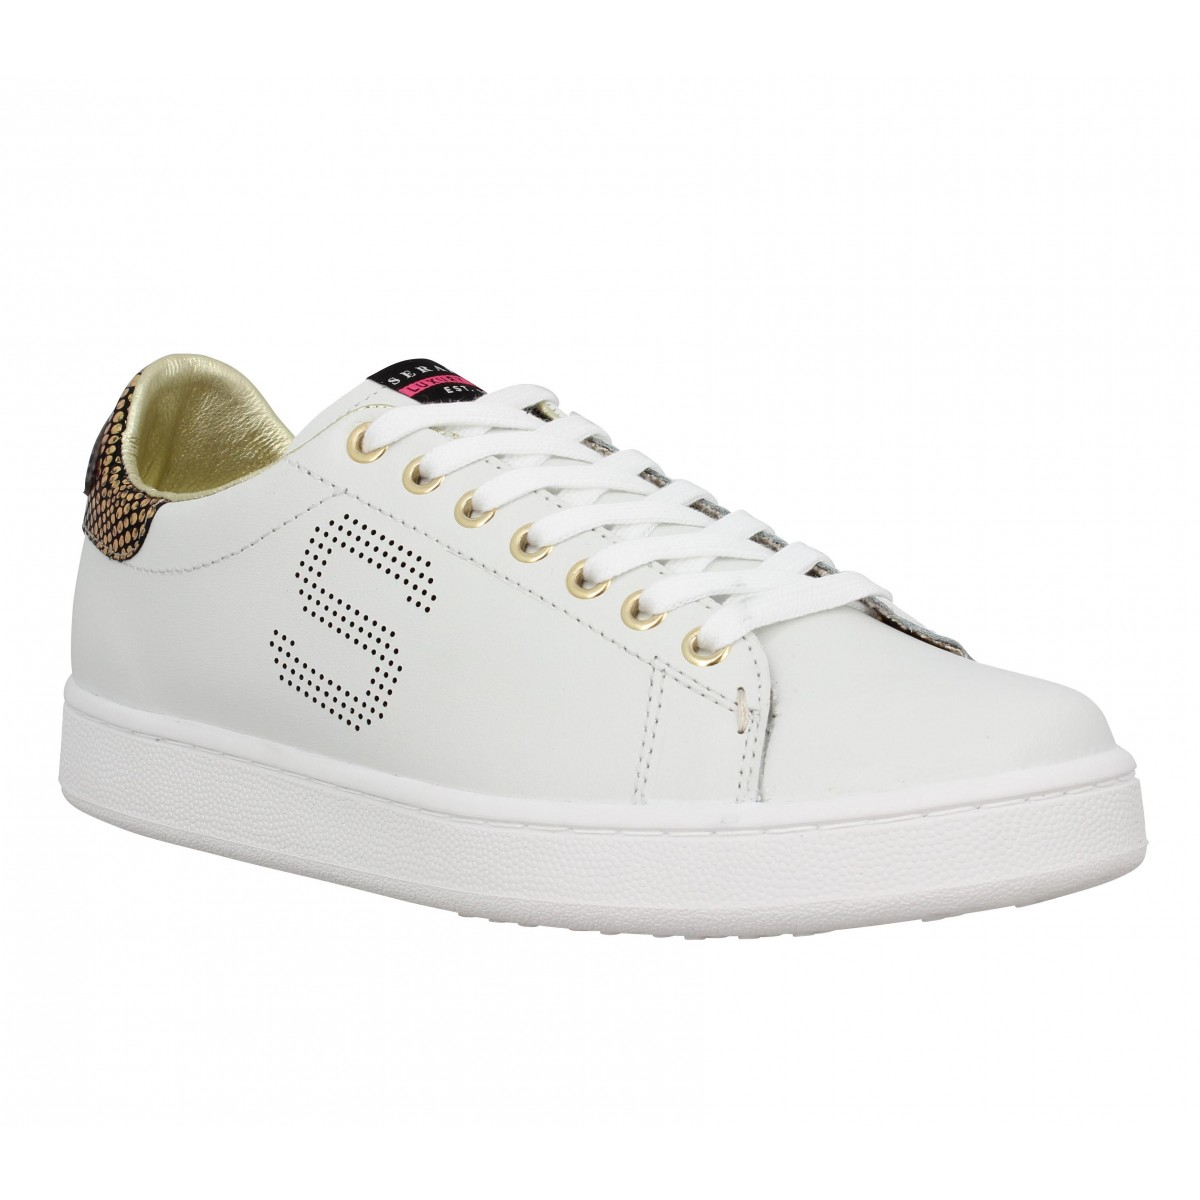 Cuir Blanc Femme Serafini Connors Lacet OrFanny Chaussures EH29IYeWDb